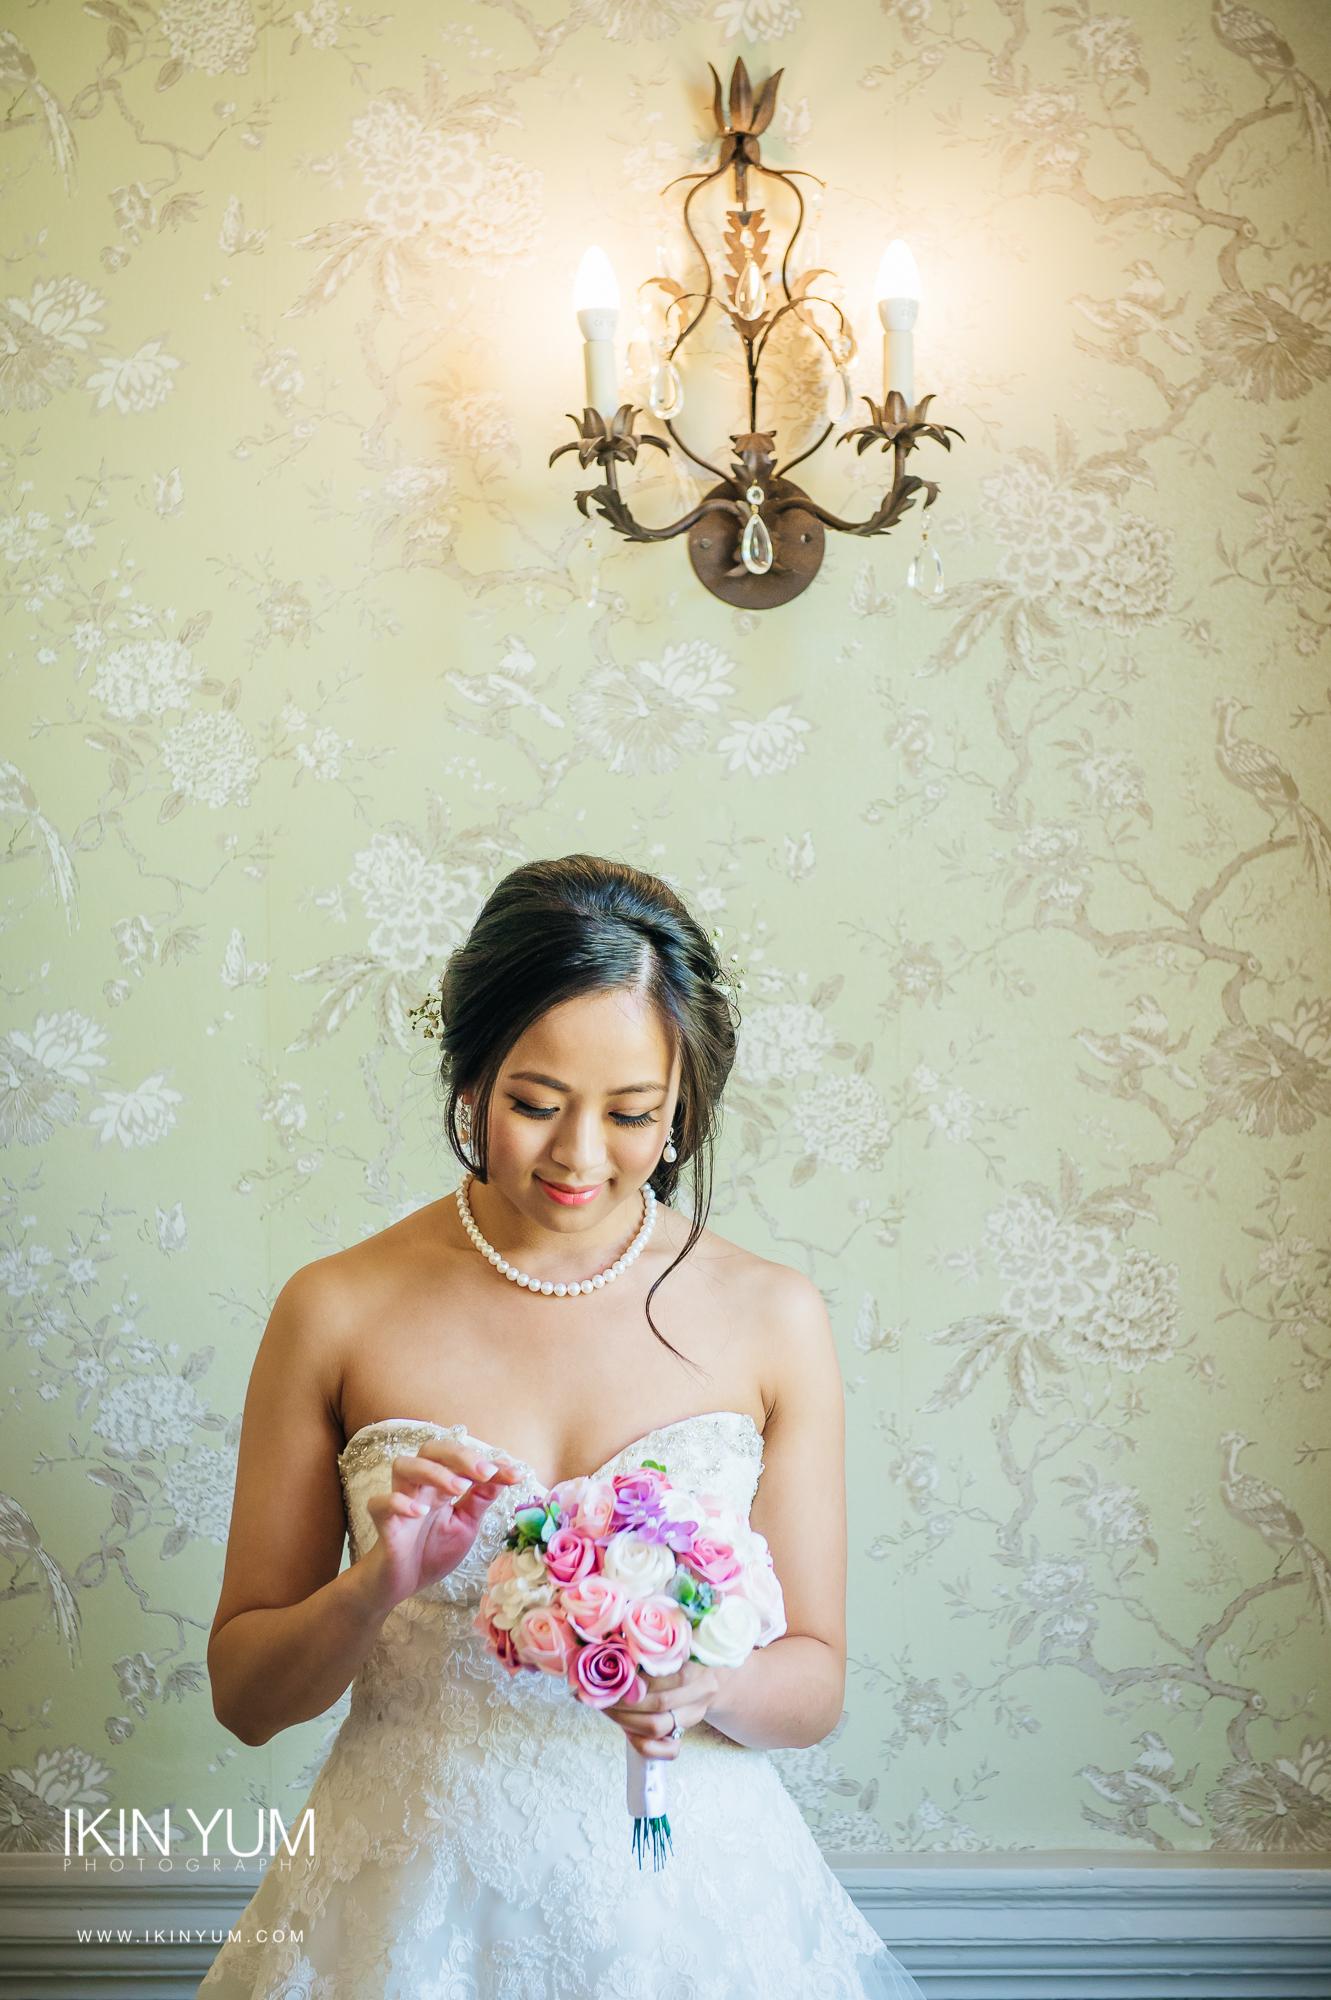 Morden Hall Wedding london - Ikin Yum Photography-033.jpg